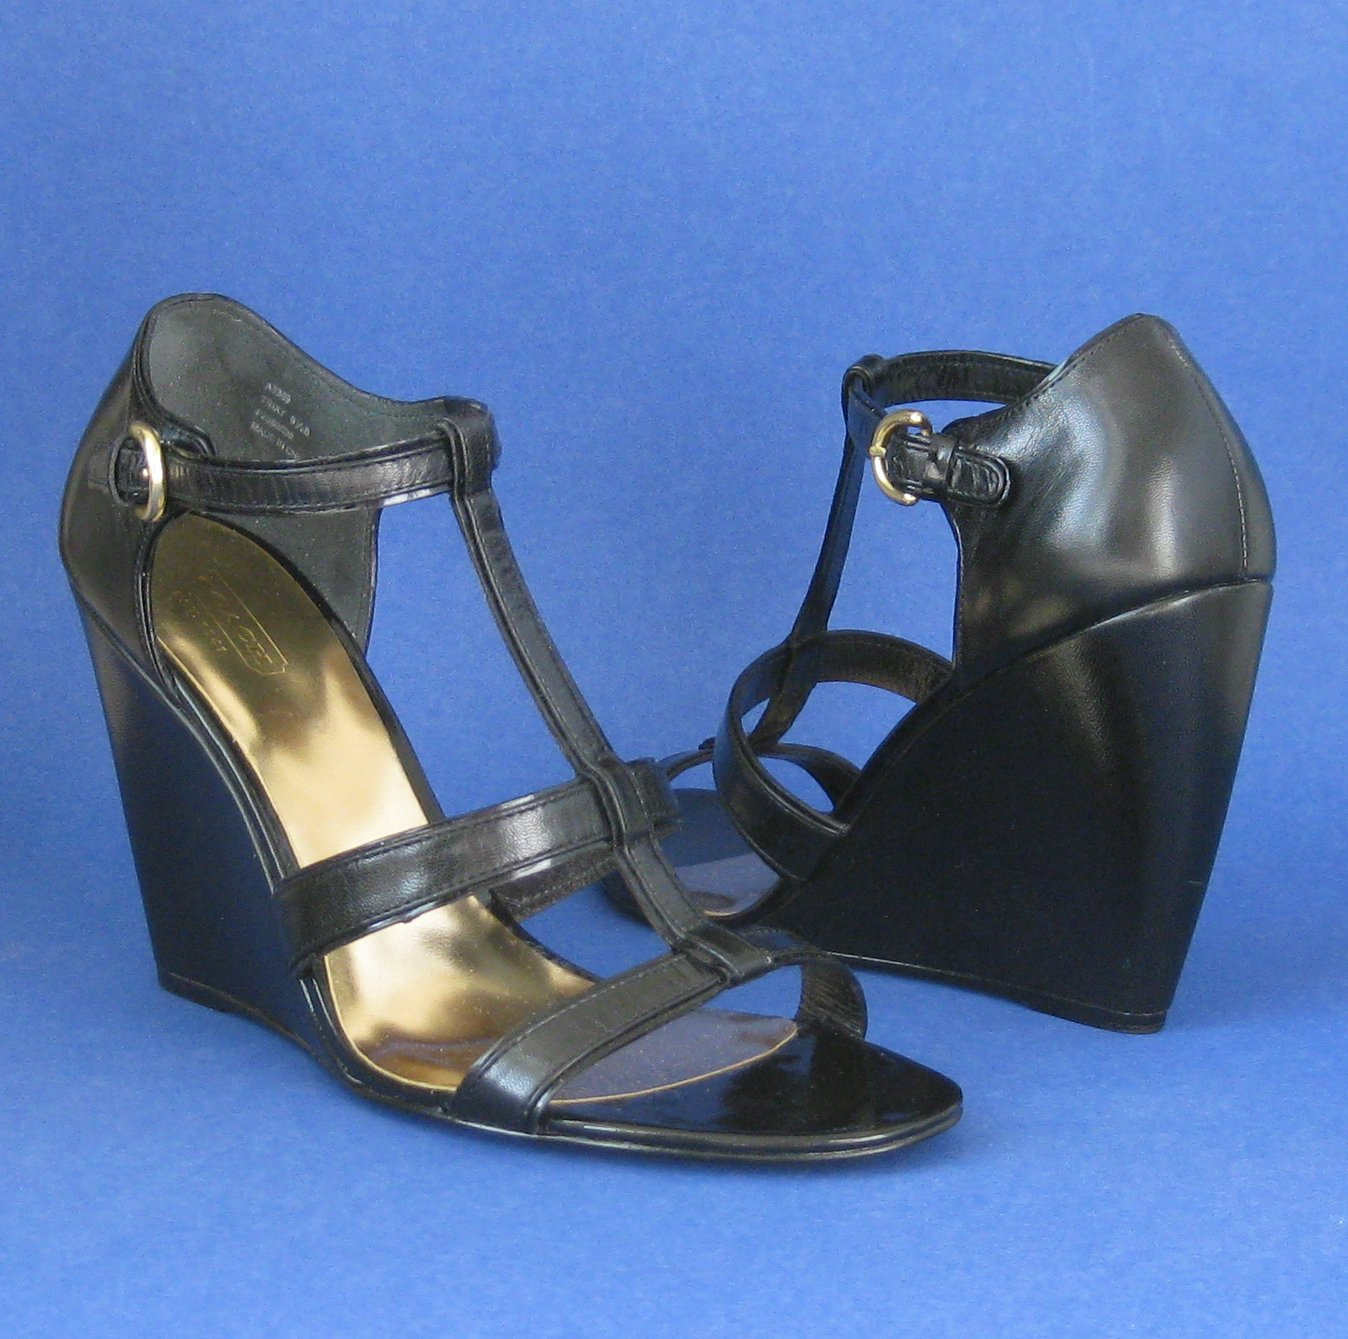 NEW Coach Trixy Black Leather Wedge Sandals #A3369 - 9.5B